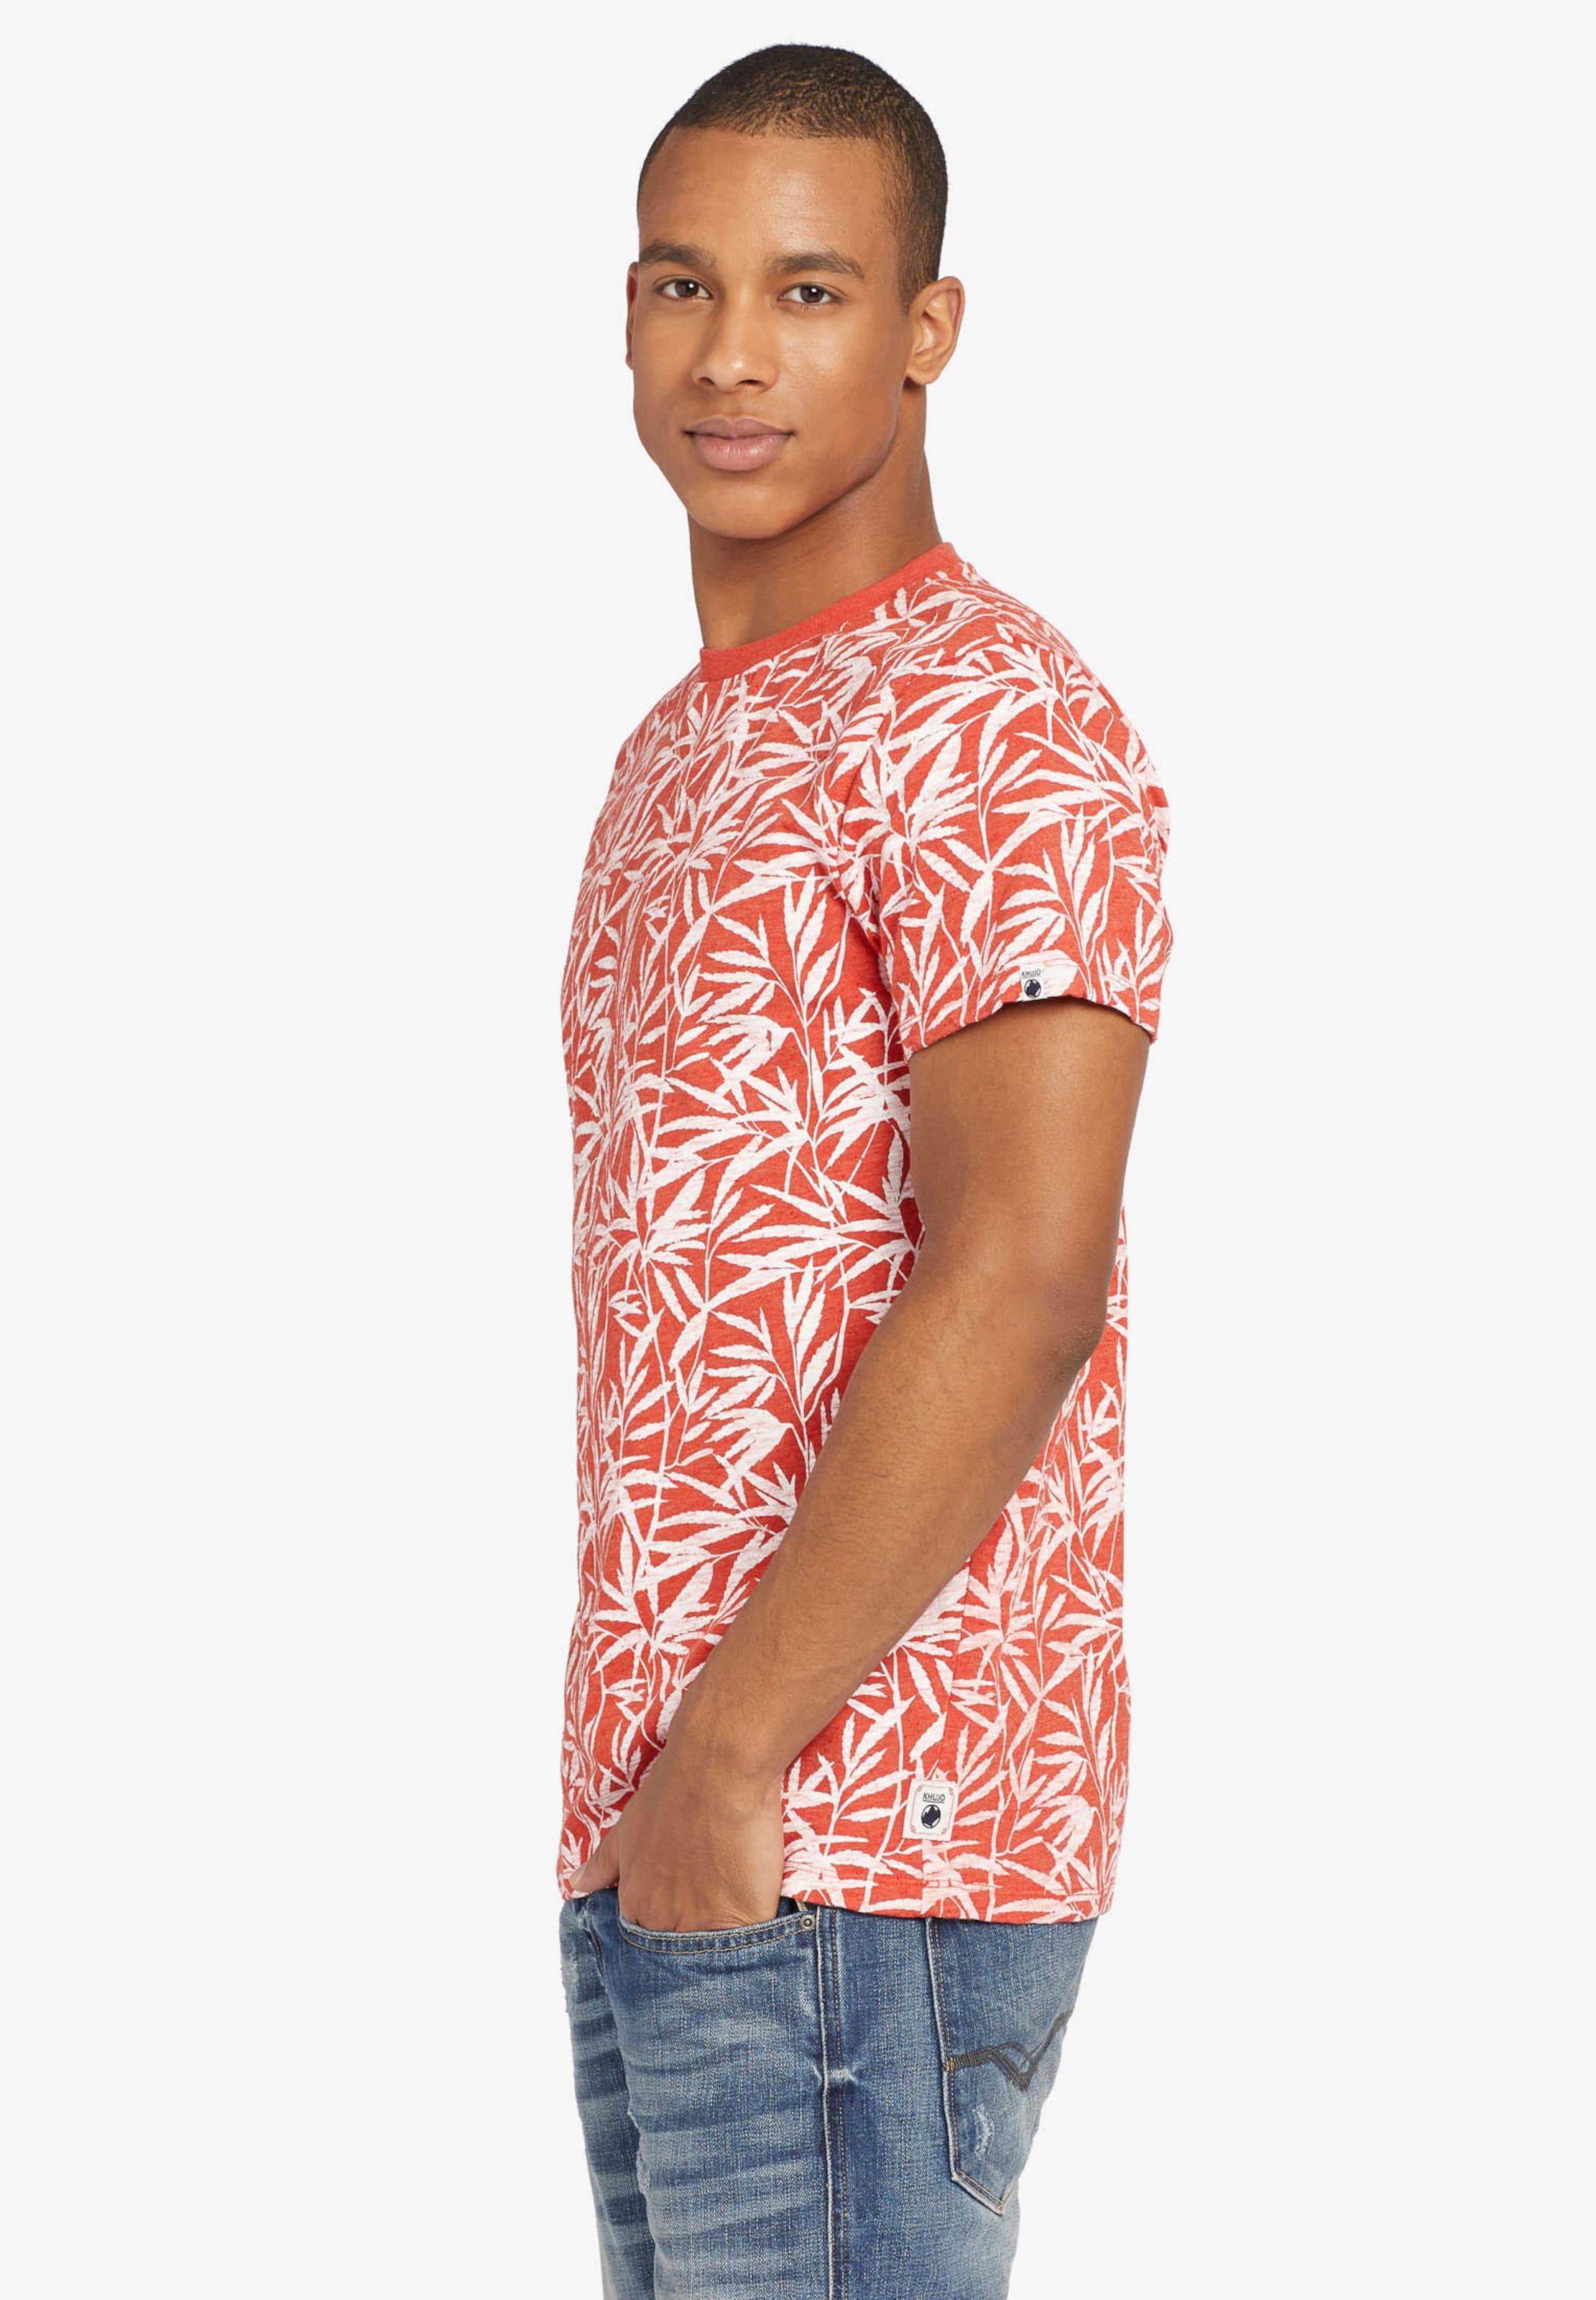 shirt Khujo En 'alberto T Leaf' CrèmeOrange PkXwO8n0